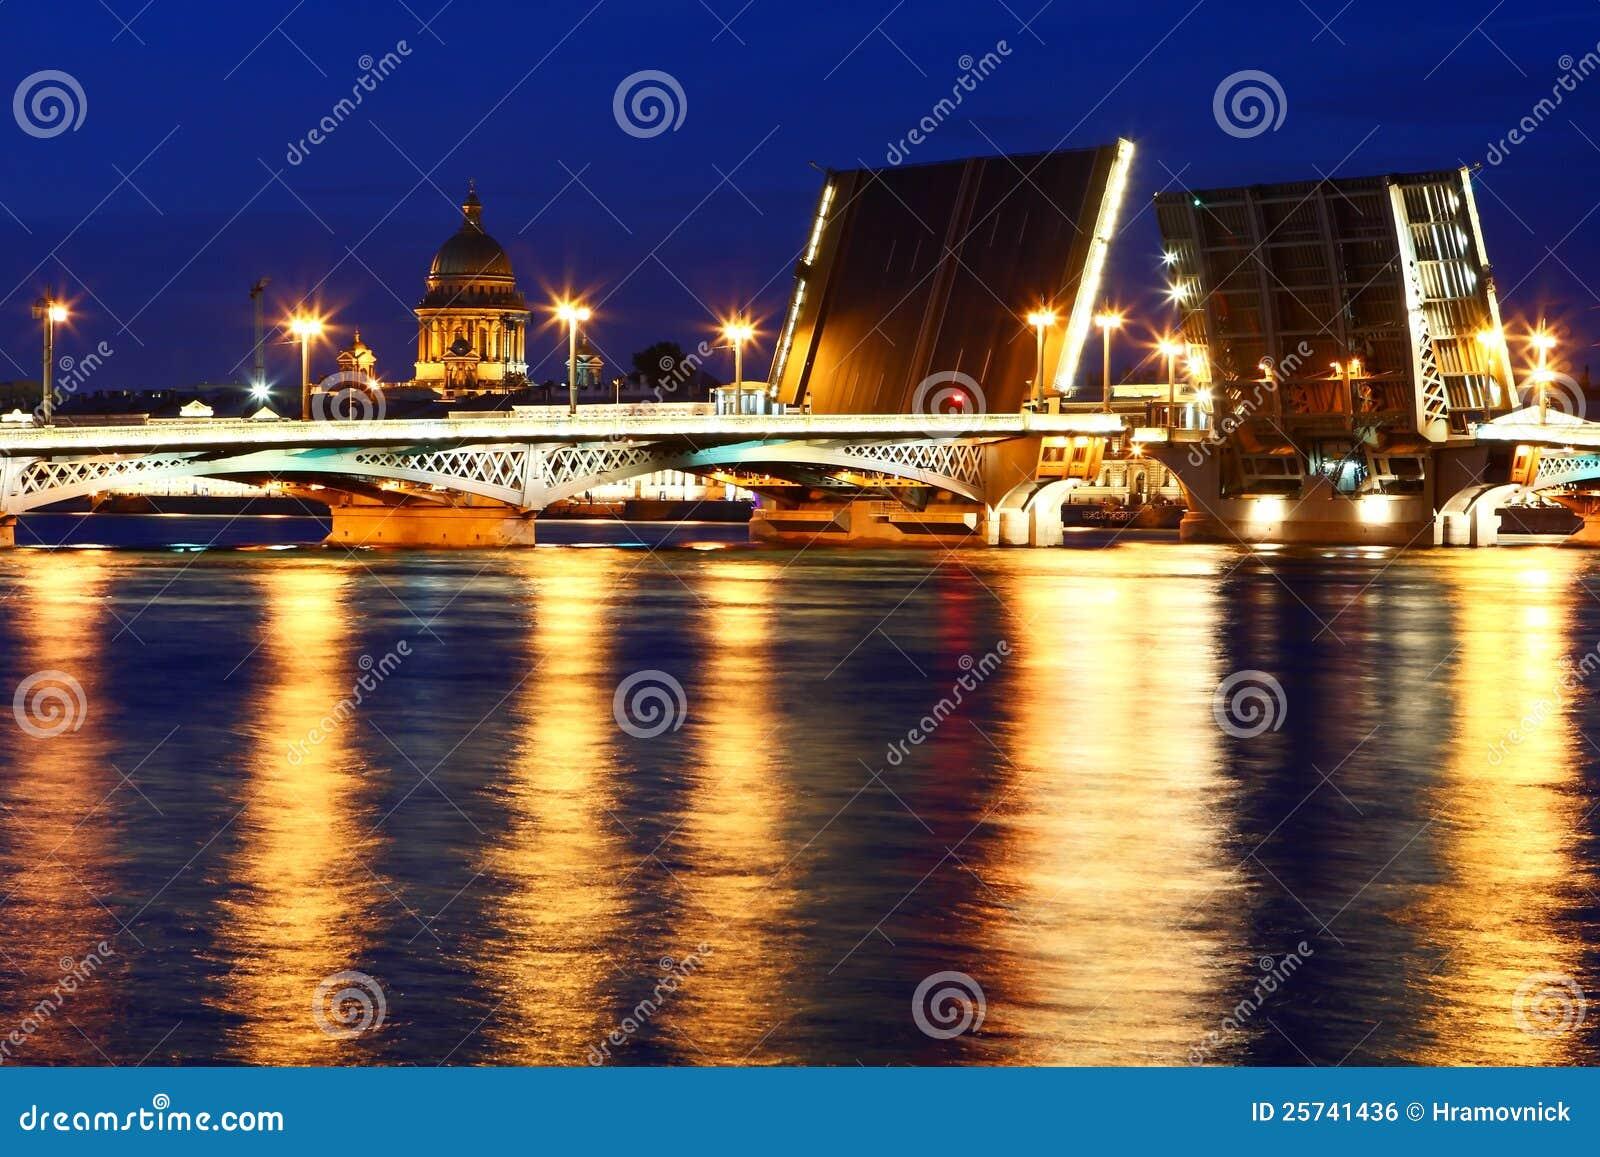 Night view of St. Petersburg